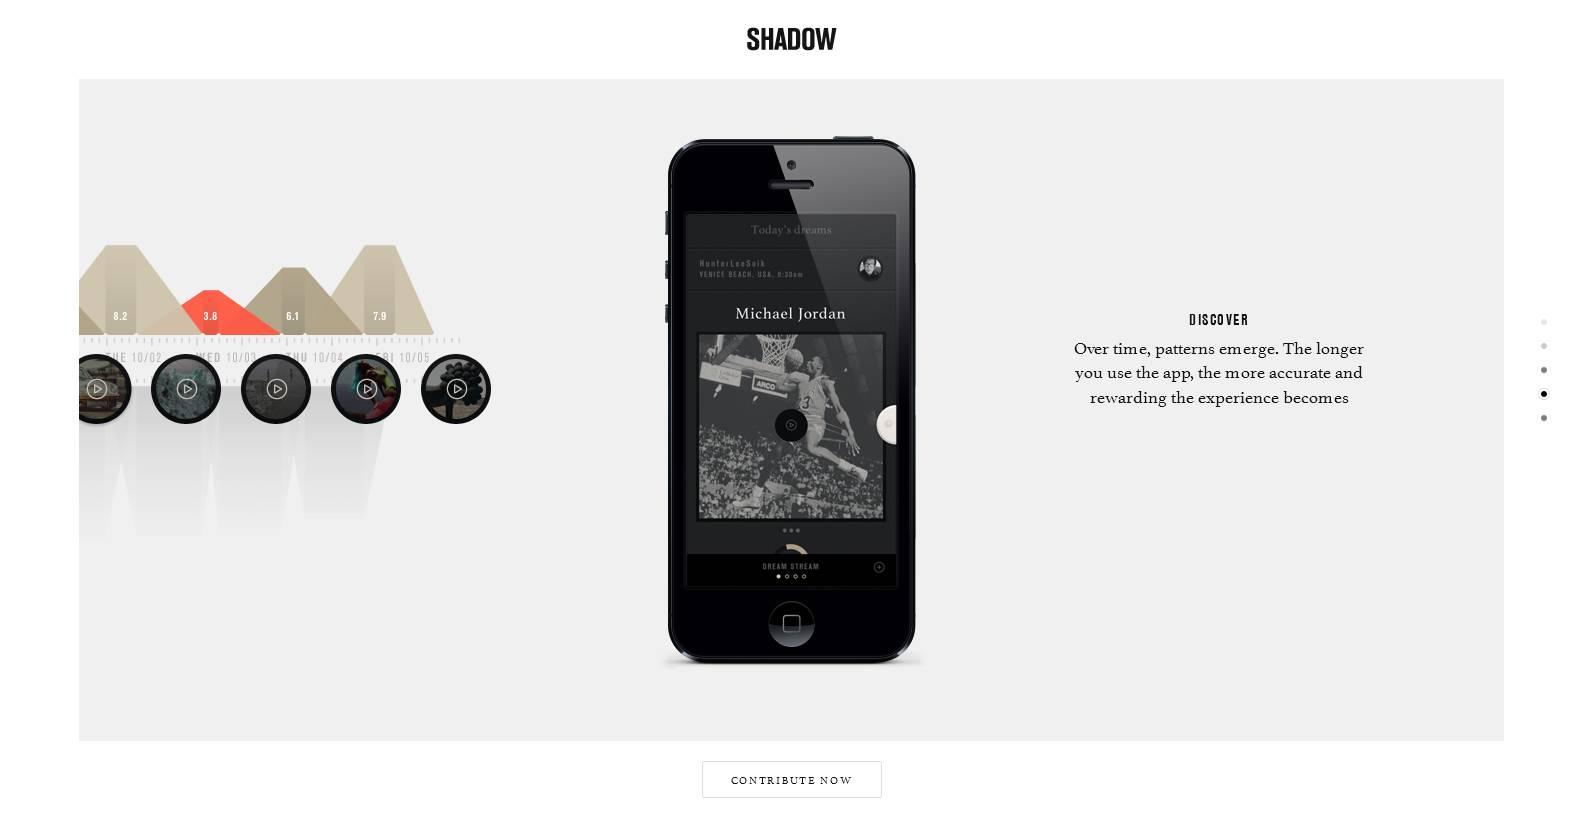 #1207 - 'SHADOW I Community of Dreamers' - discovershadow_com